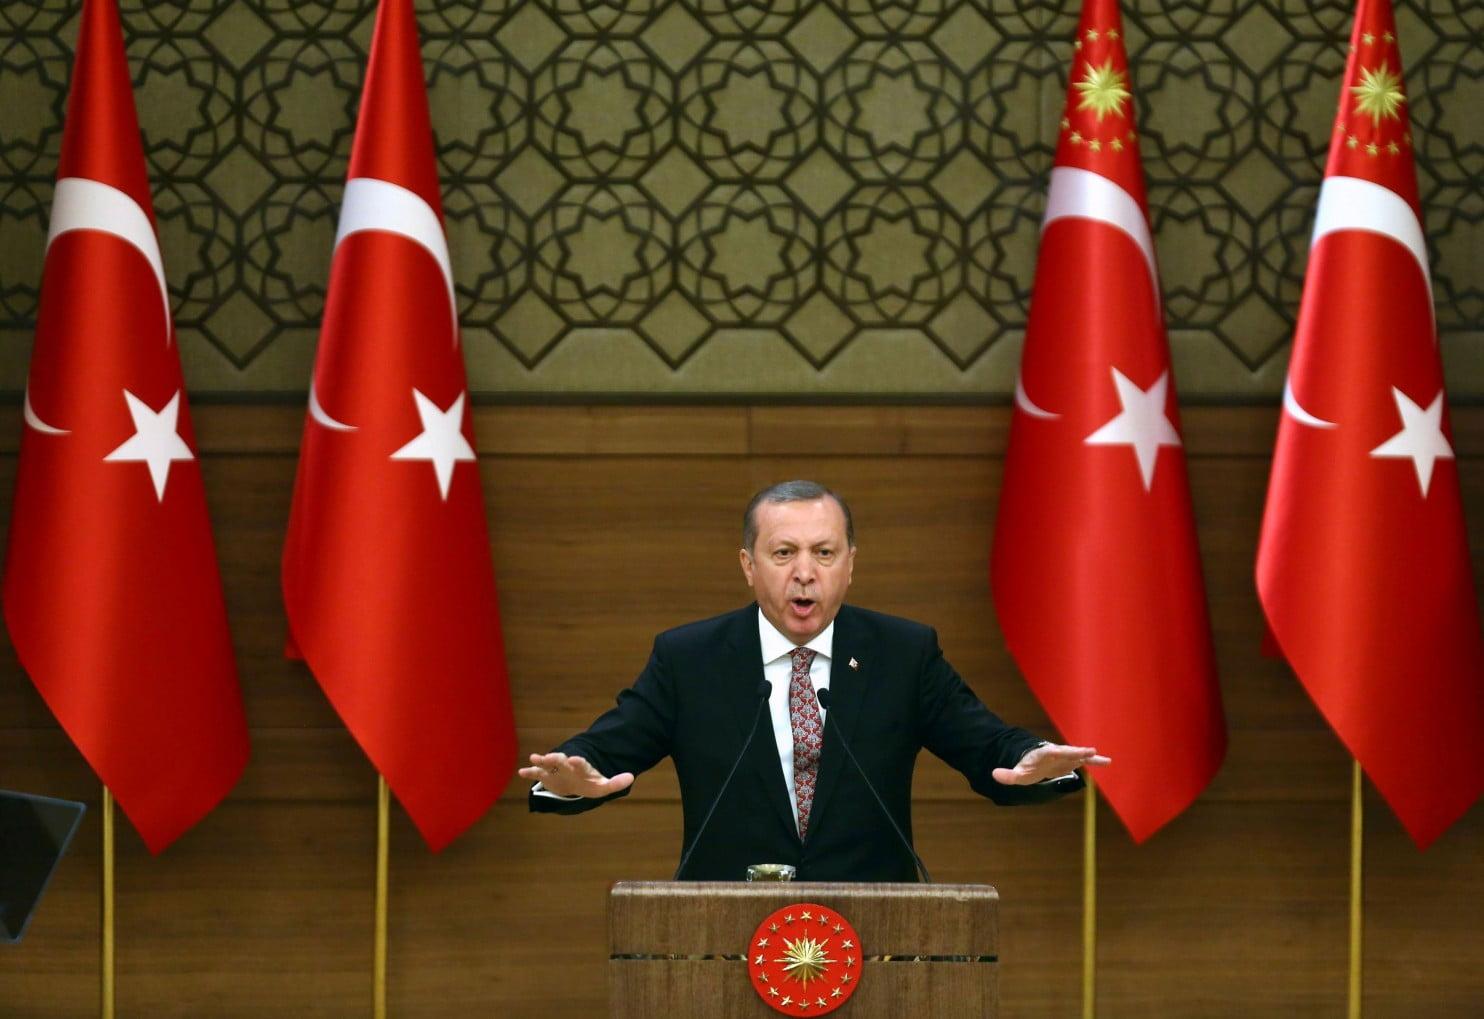 Turkish President Recep Tayyip Erdogan. (Adem Altan / Agence France-Presse